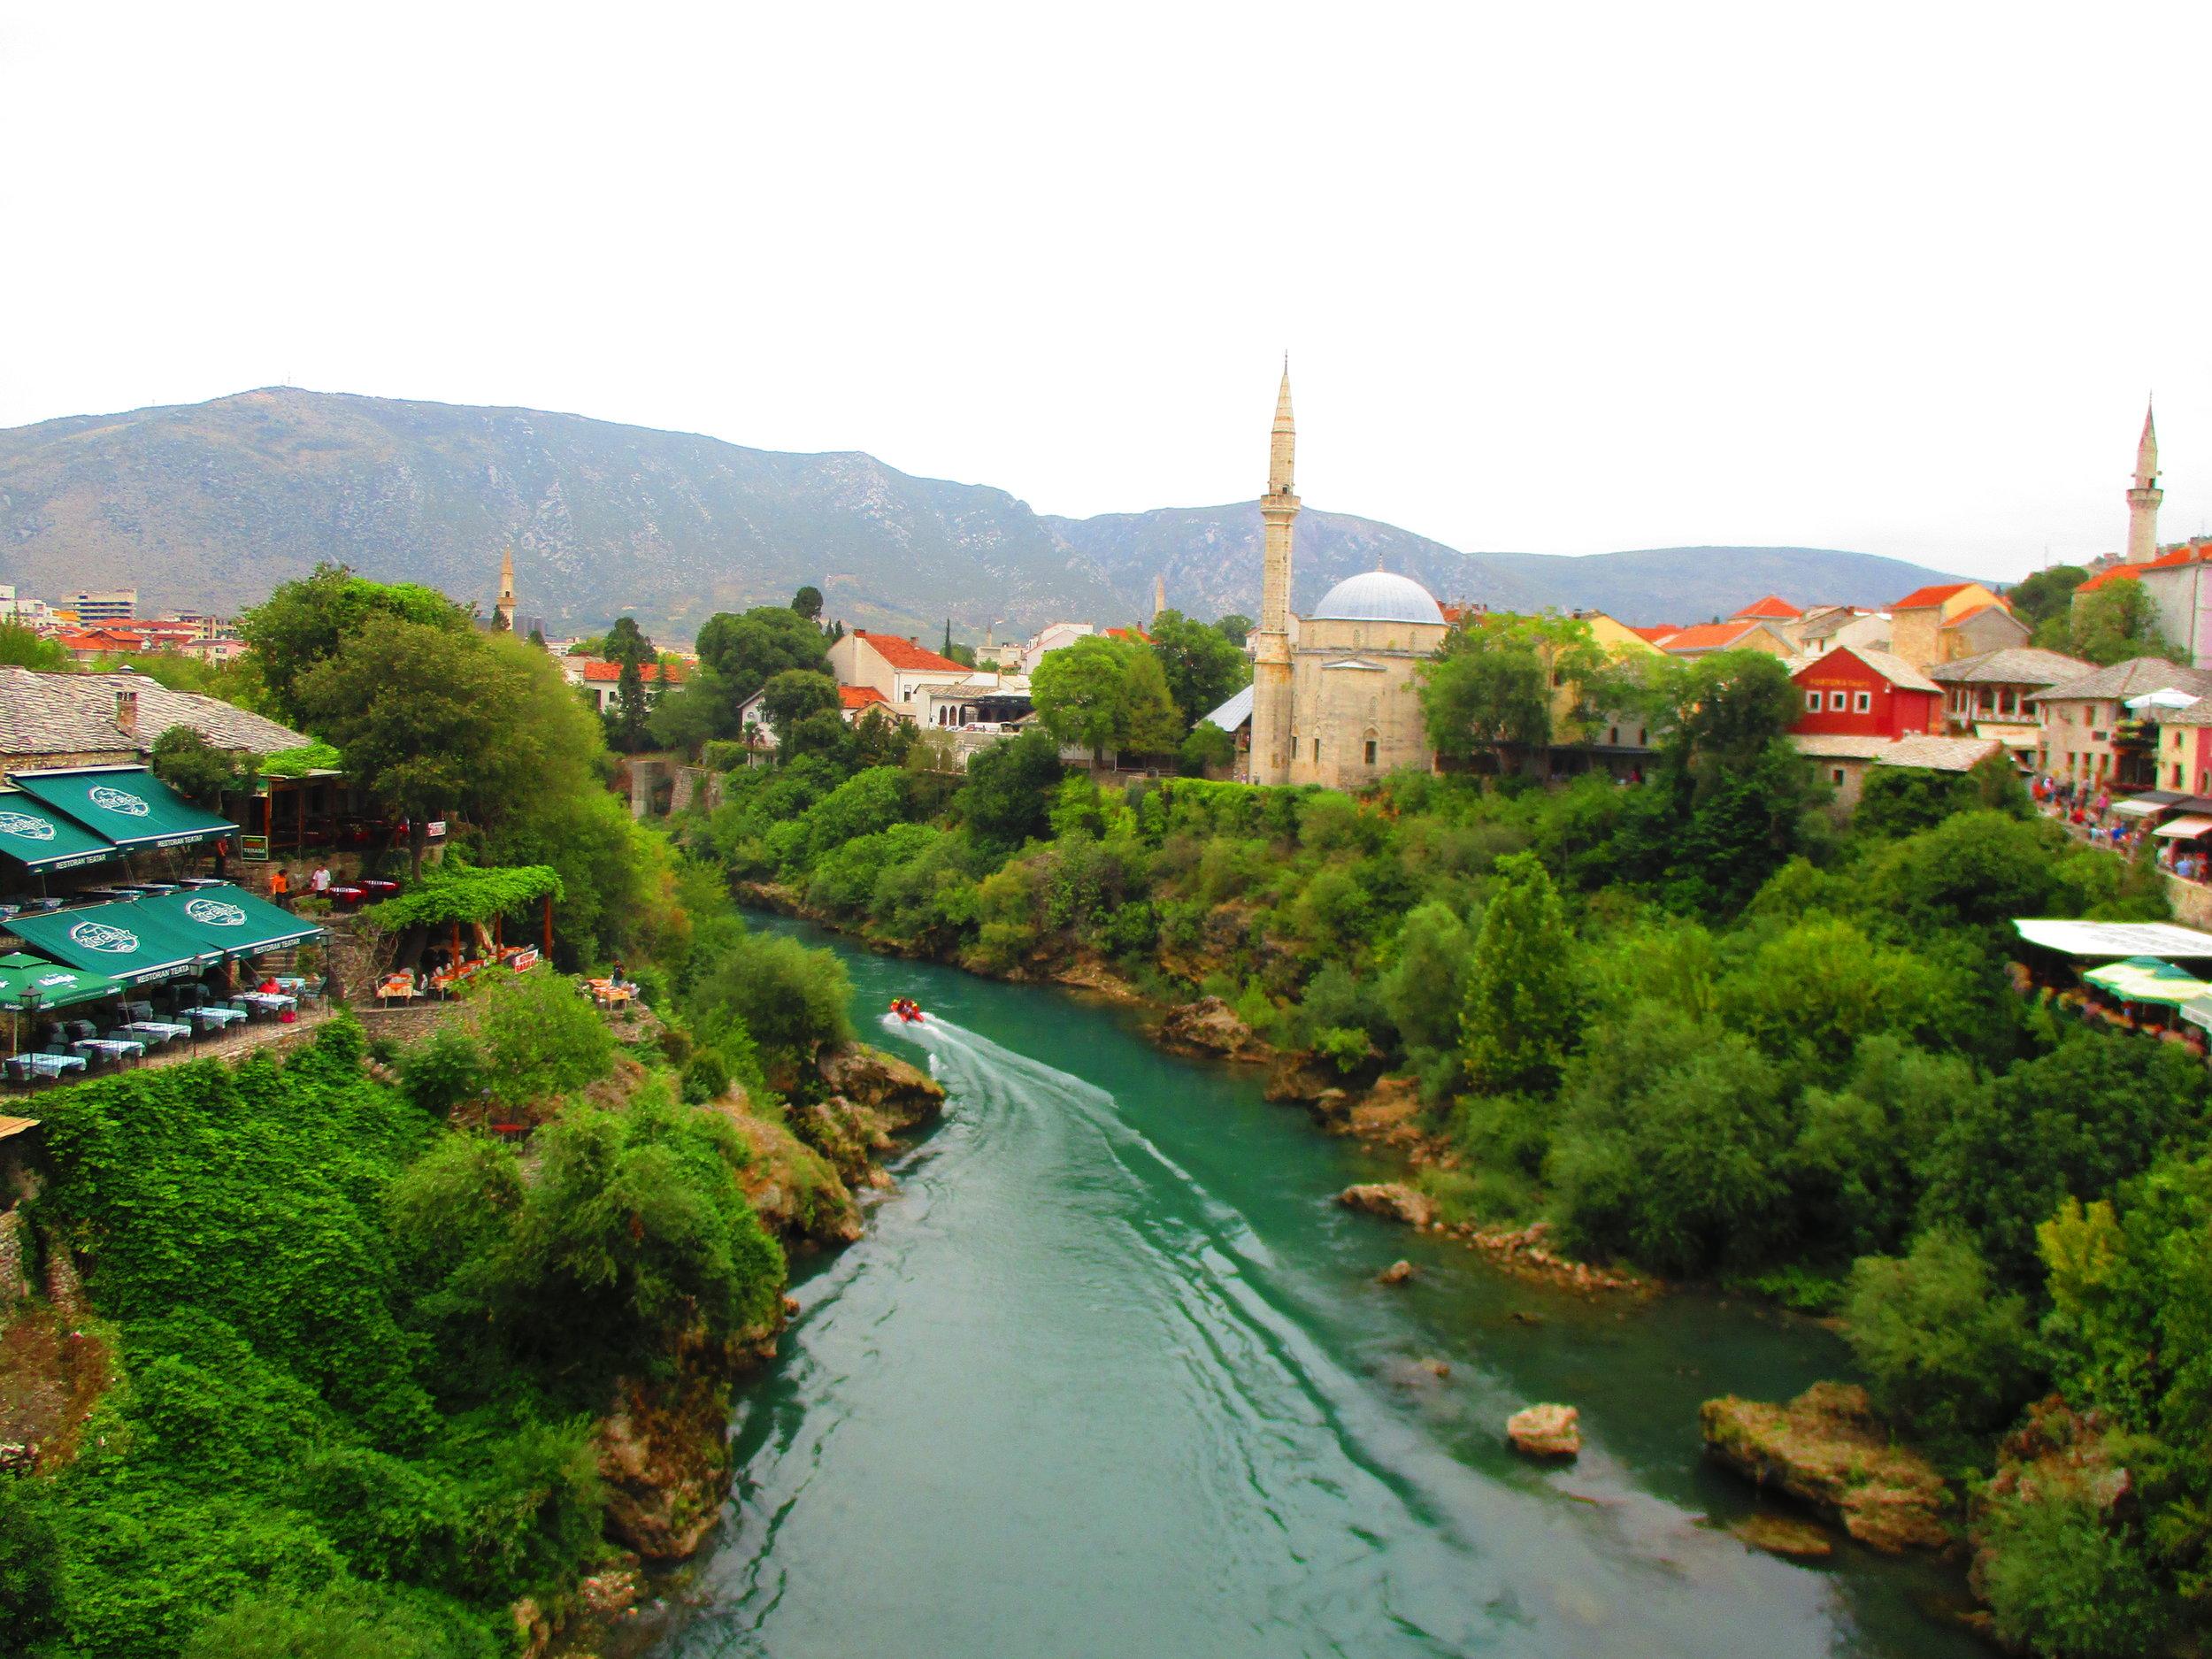 The city of Mostar, Bosnia and Herzegovina